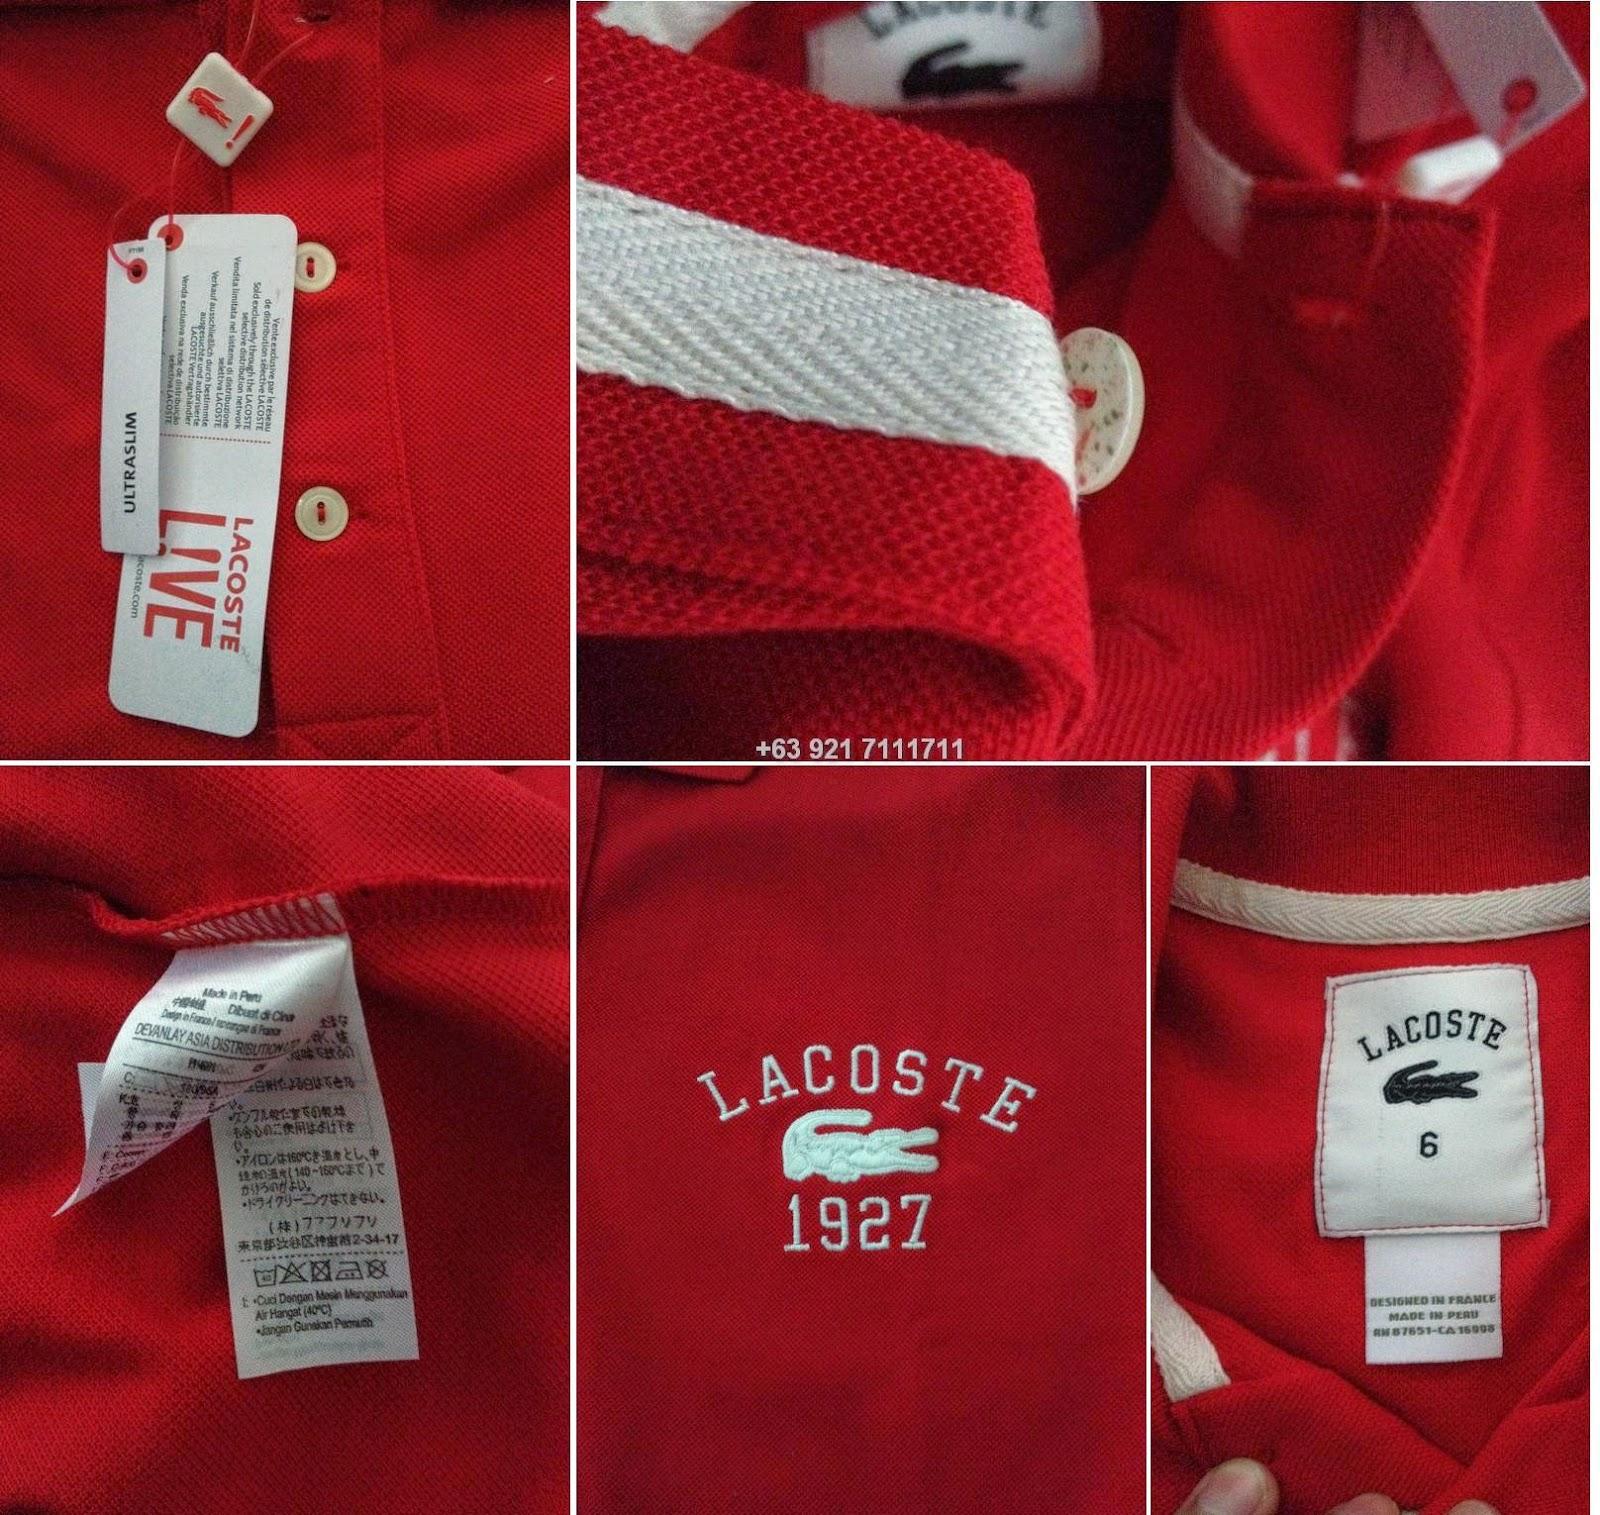 wholesale lacoste polo shirts sale   OFF46% Discounts ea4af3a67f